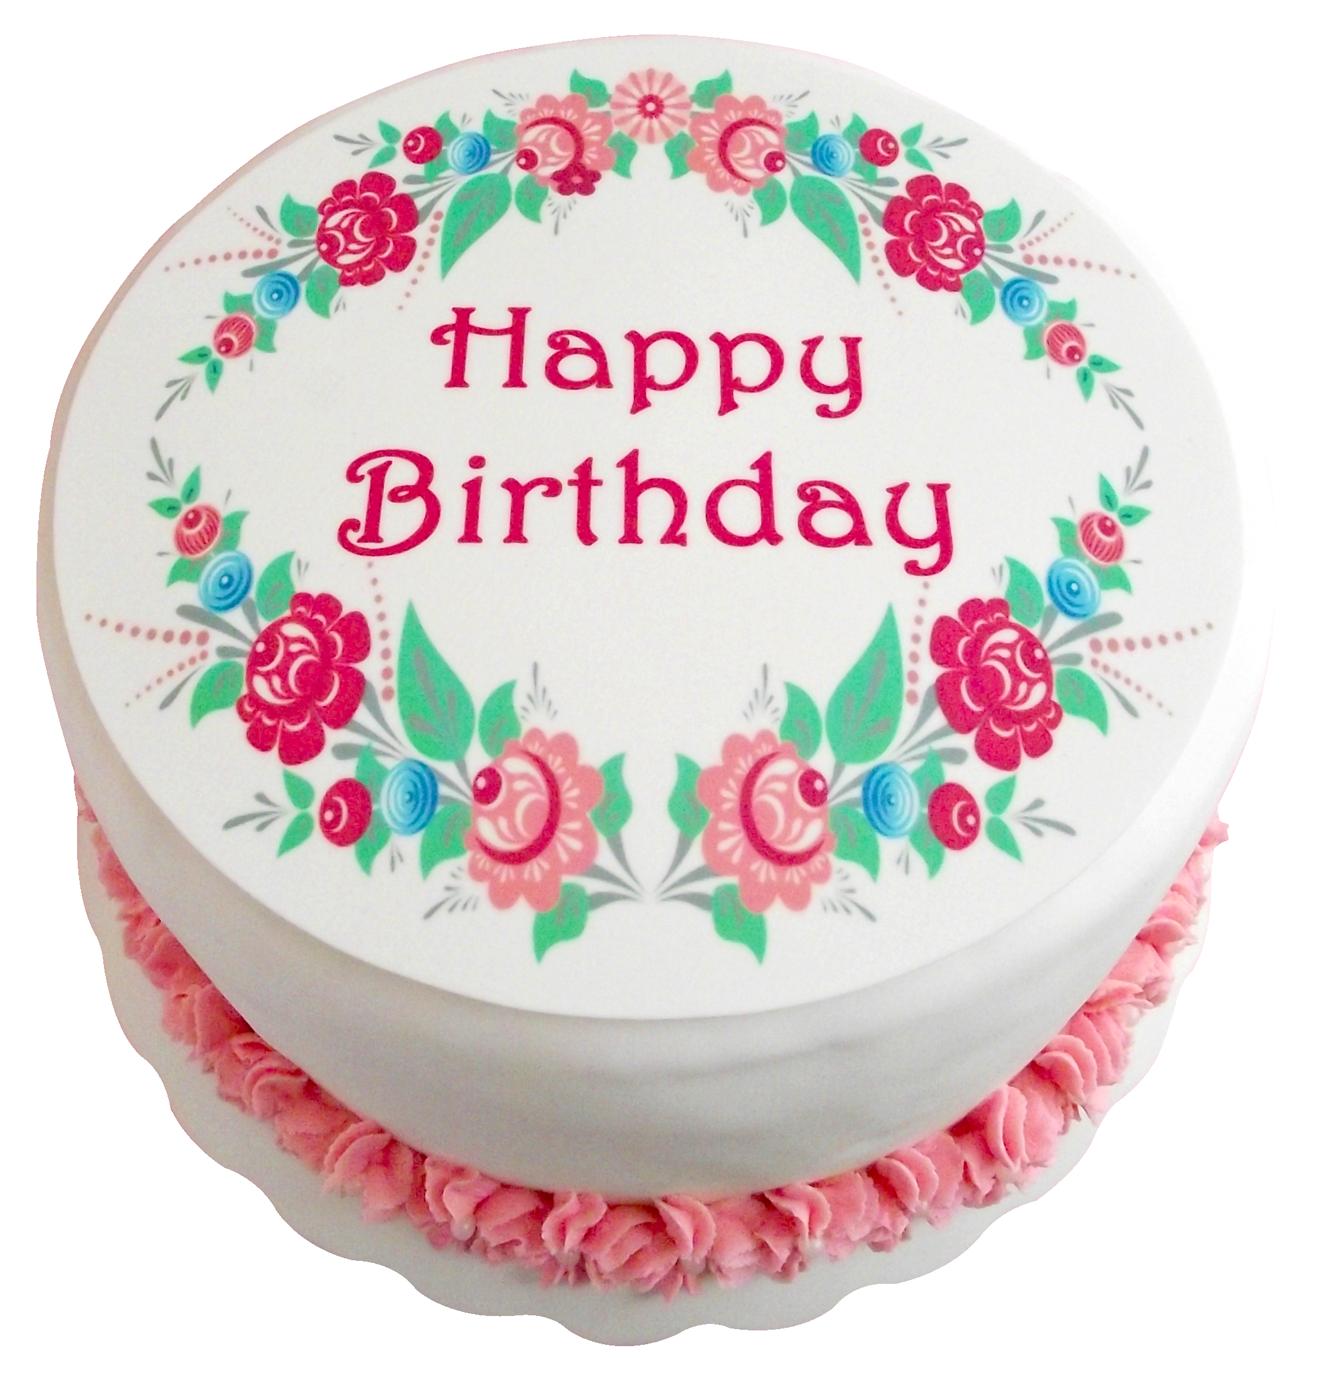 Birthday Cake On Transparency